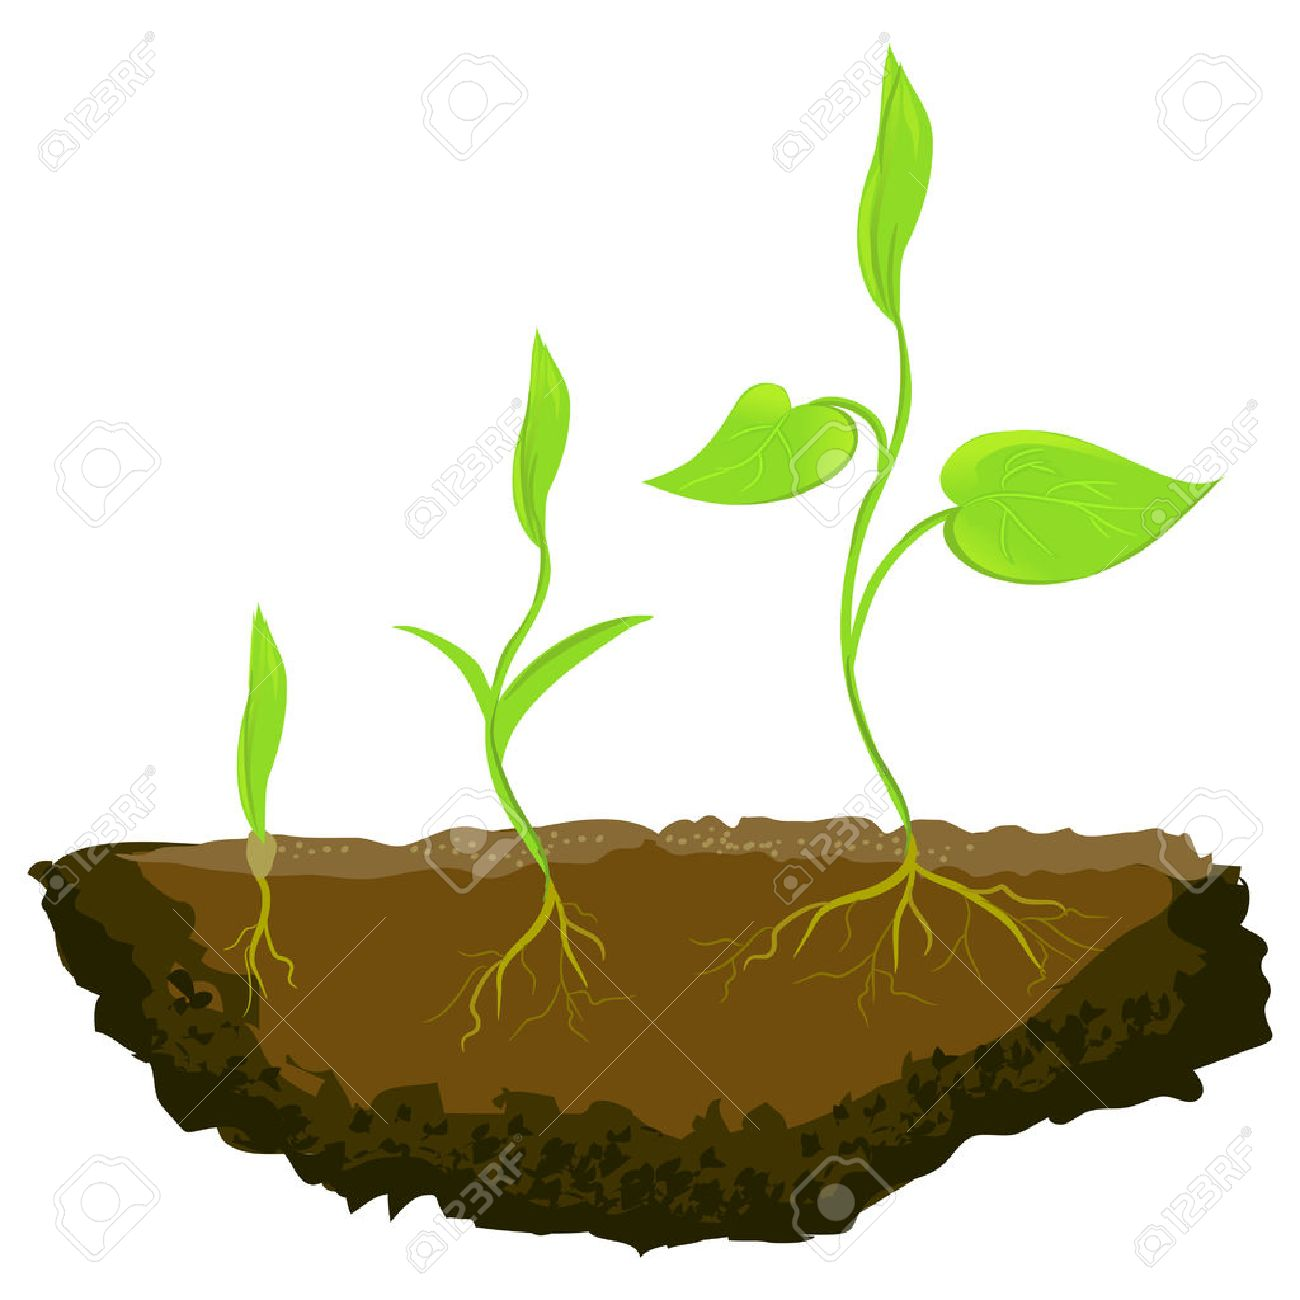 2 3 plantsplant clipart svg transparent Growing Plant Clipart | Free download best Growing Plant Clipart on ... svg transparent